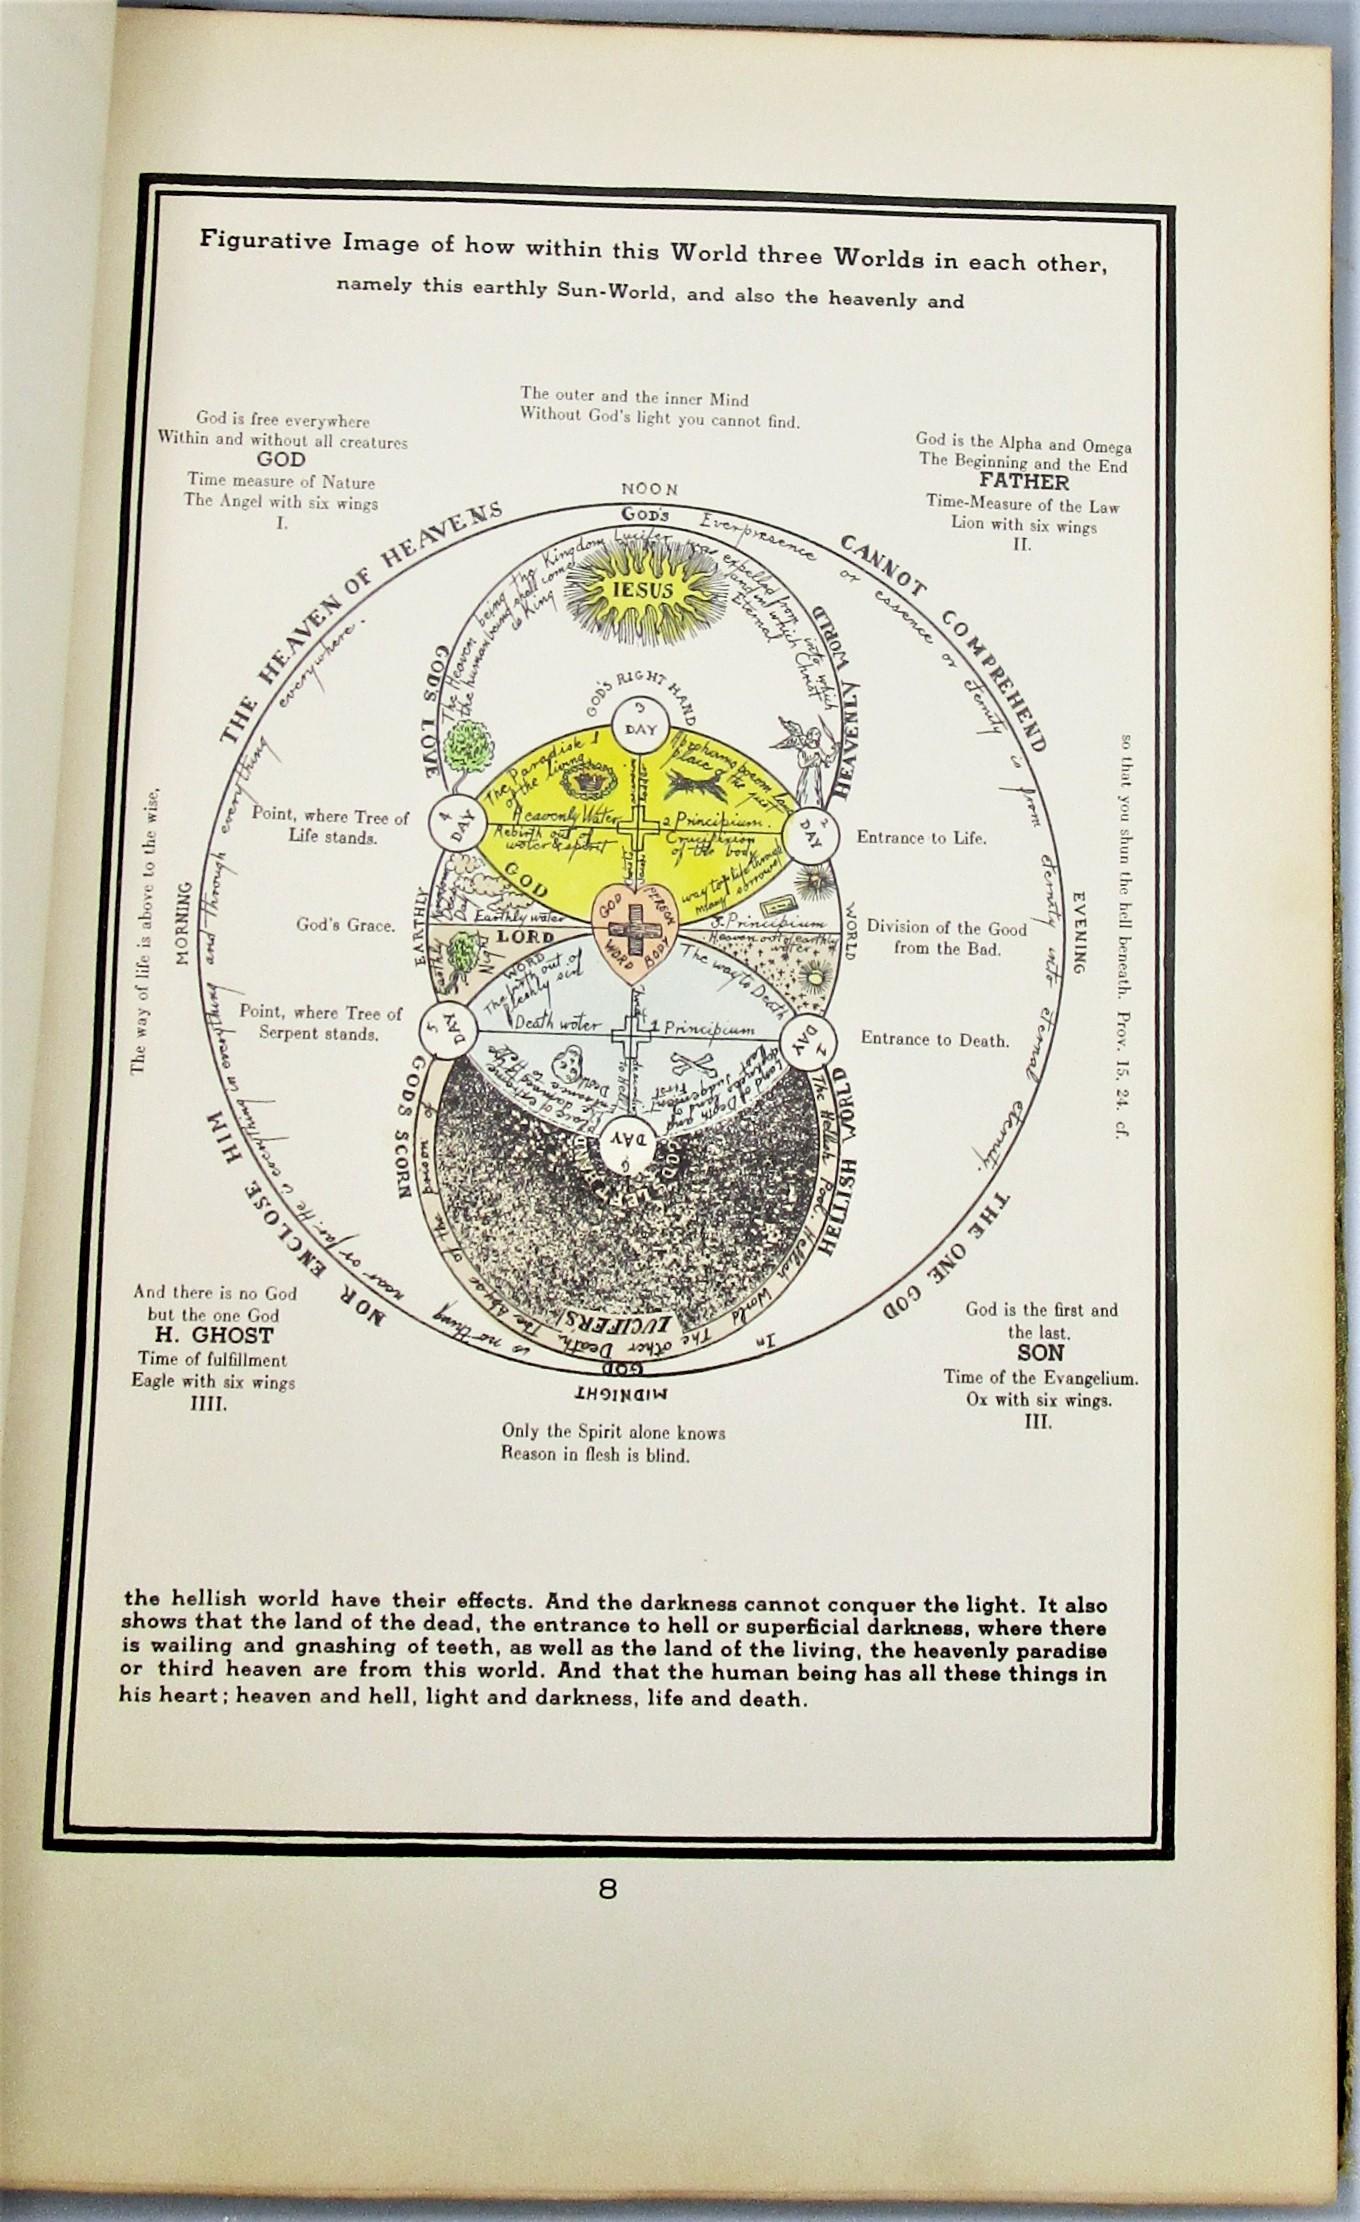 SECRET SYMBOLS OF THE ROSICRUCIANS - 1935 [plates]